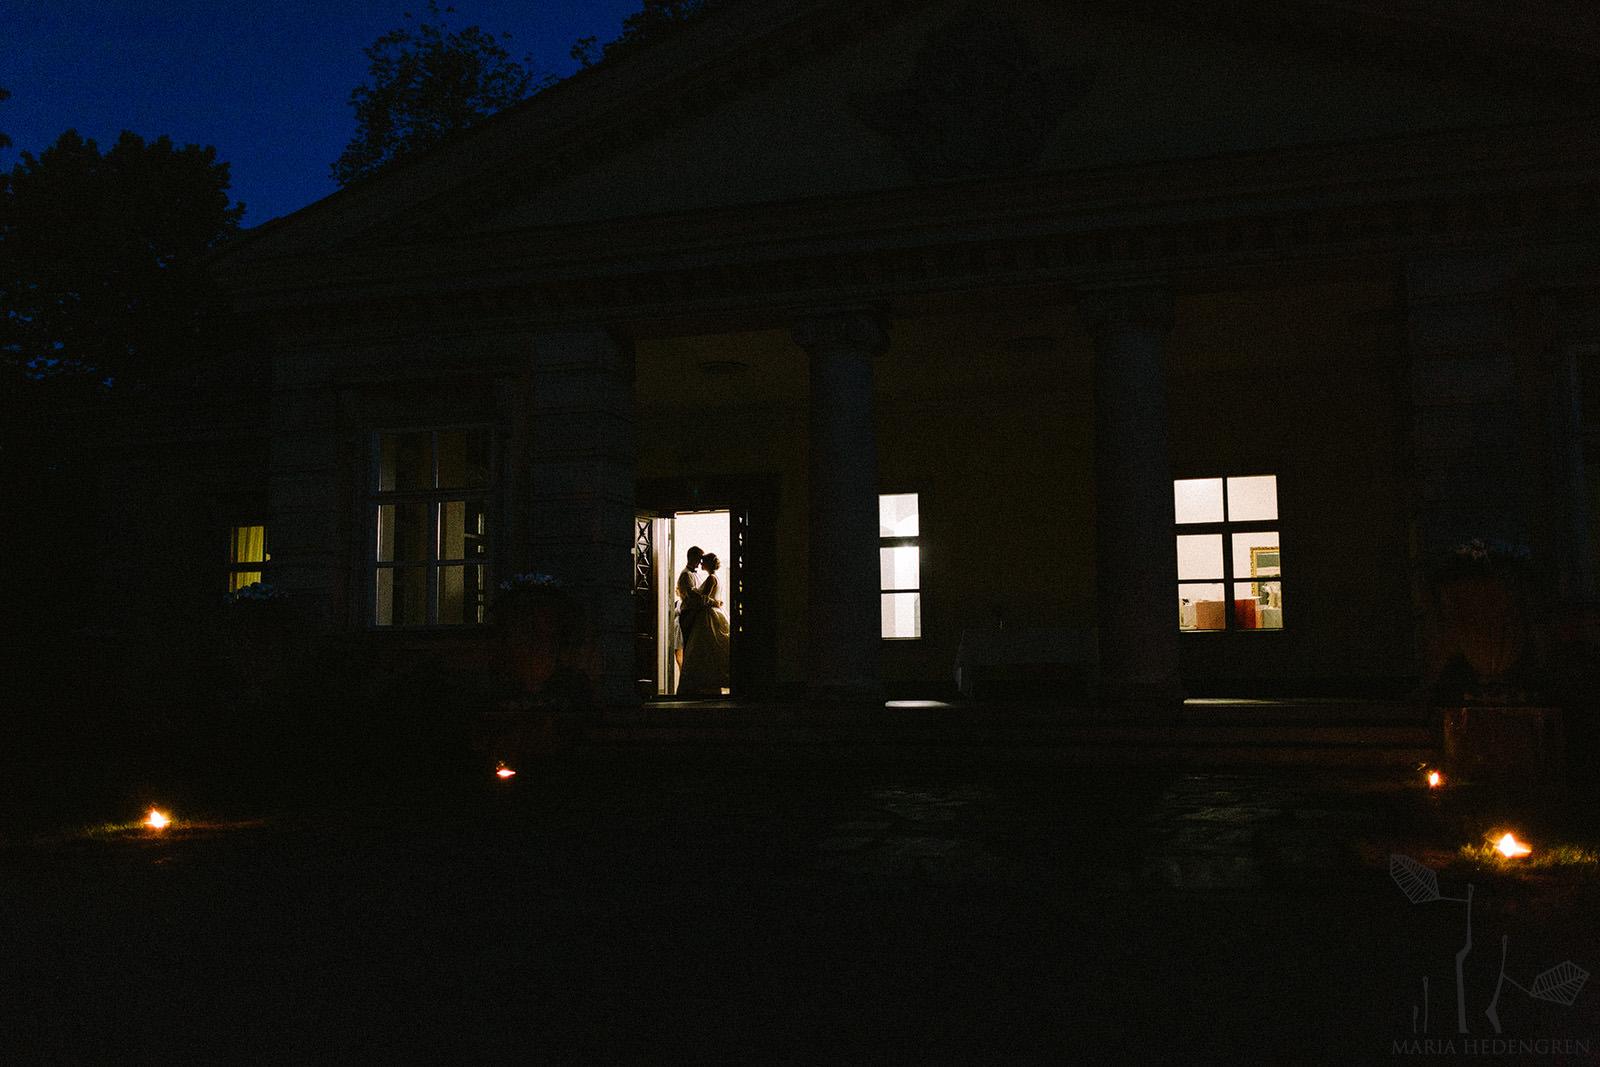 Image by International Photographer Maria Hedengren www.mariahedengren.com